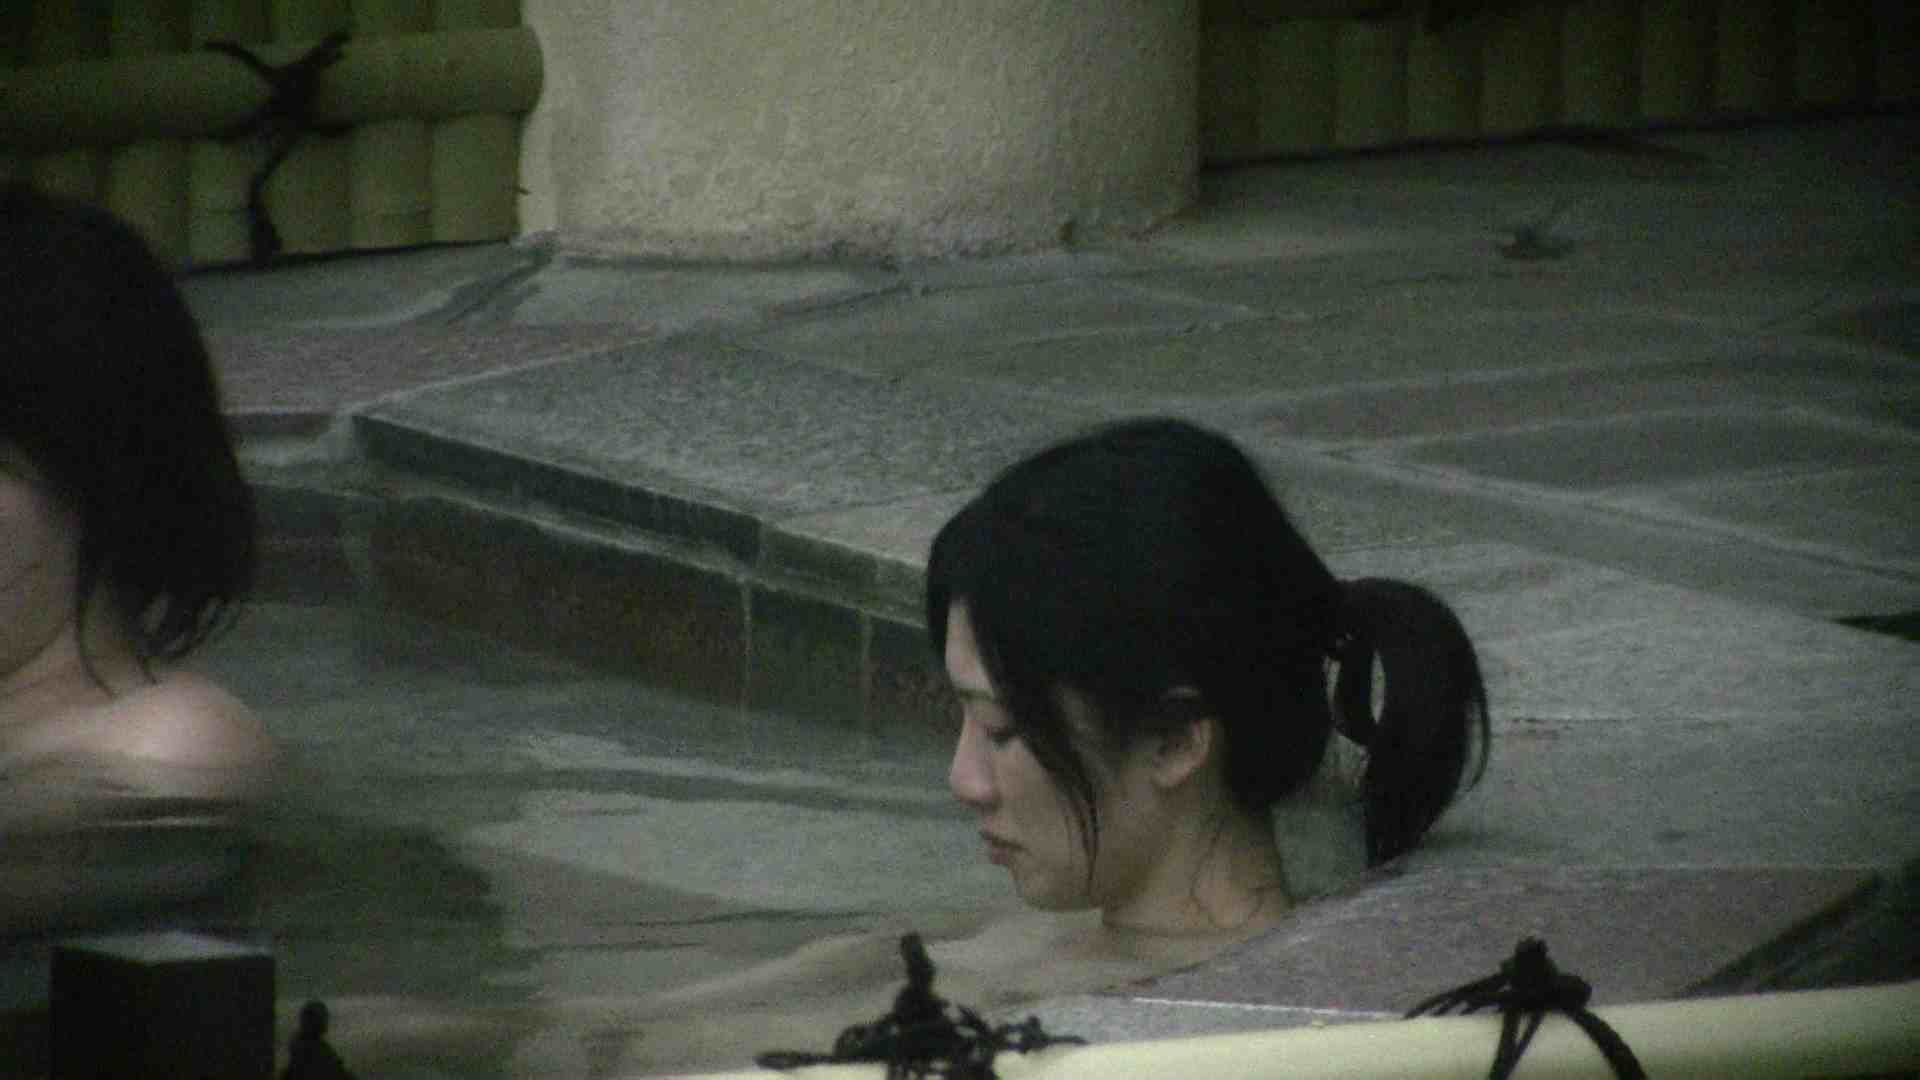 Aquaな露天風呂Vol.539 OL女体 | 露天  88連発 46